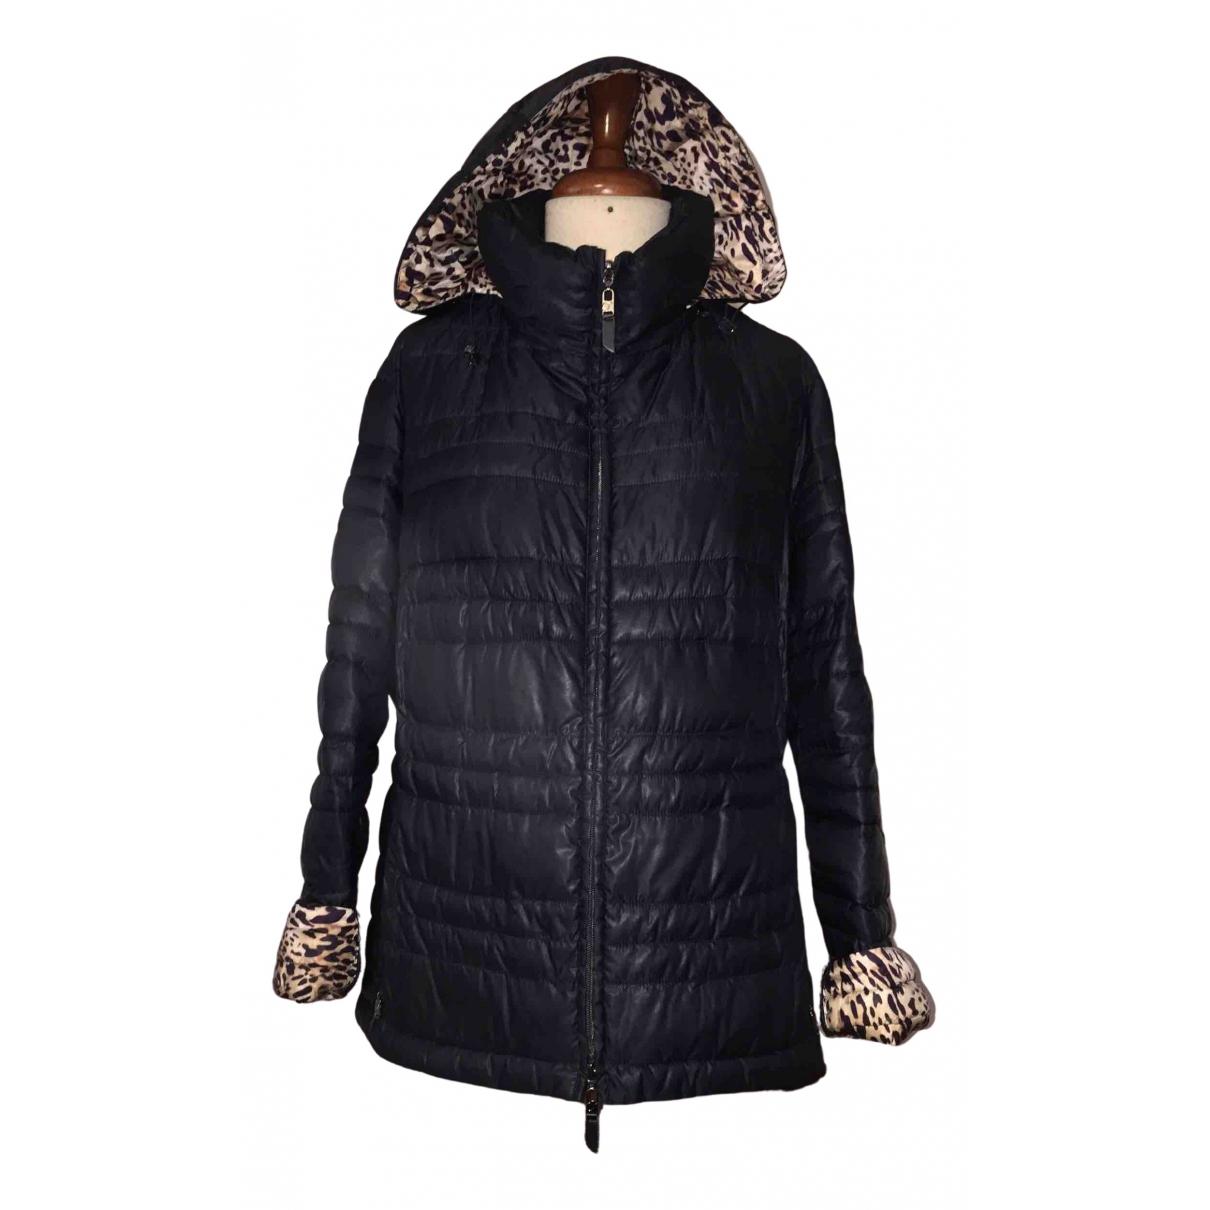 Elena Miro N Black jacket for Women 12 US